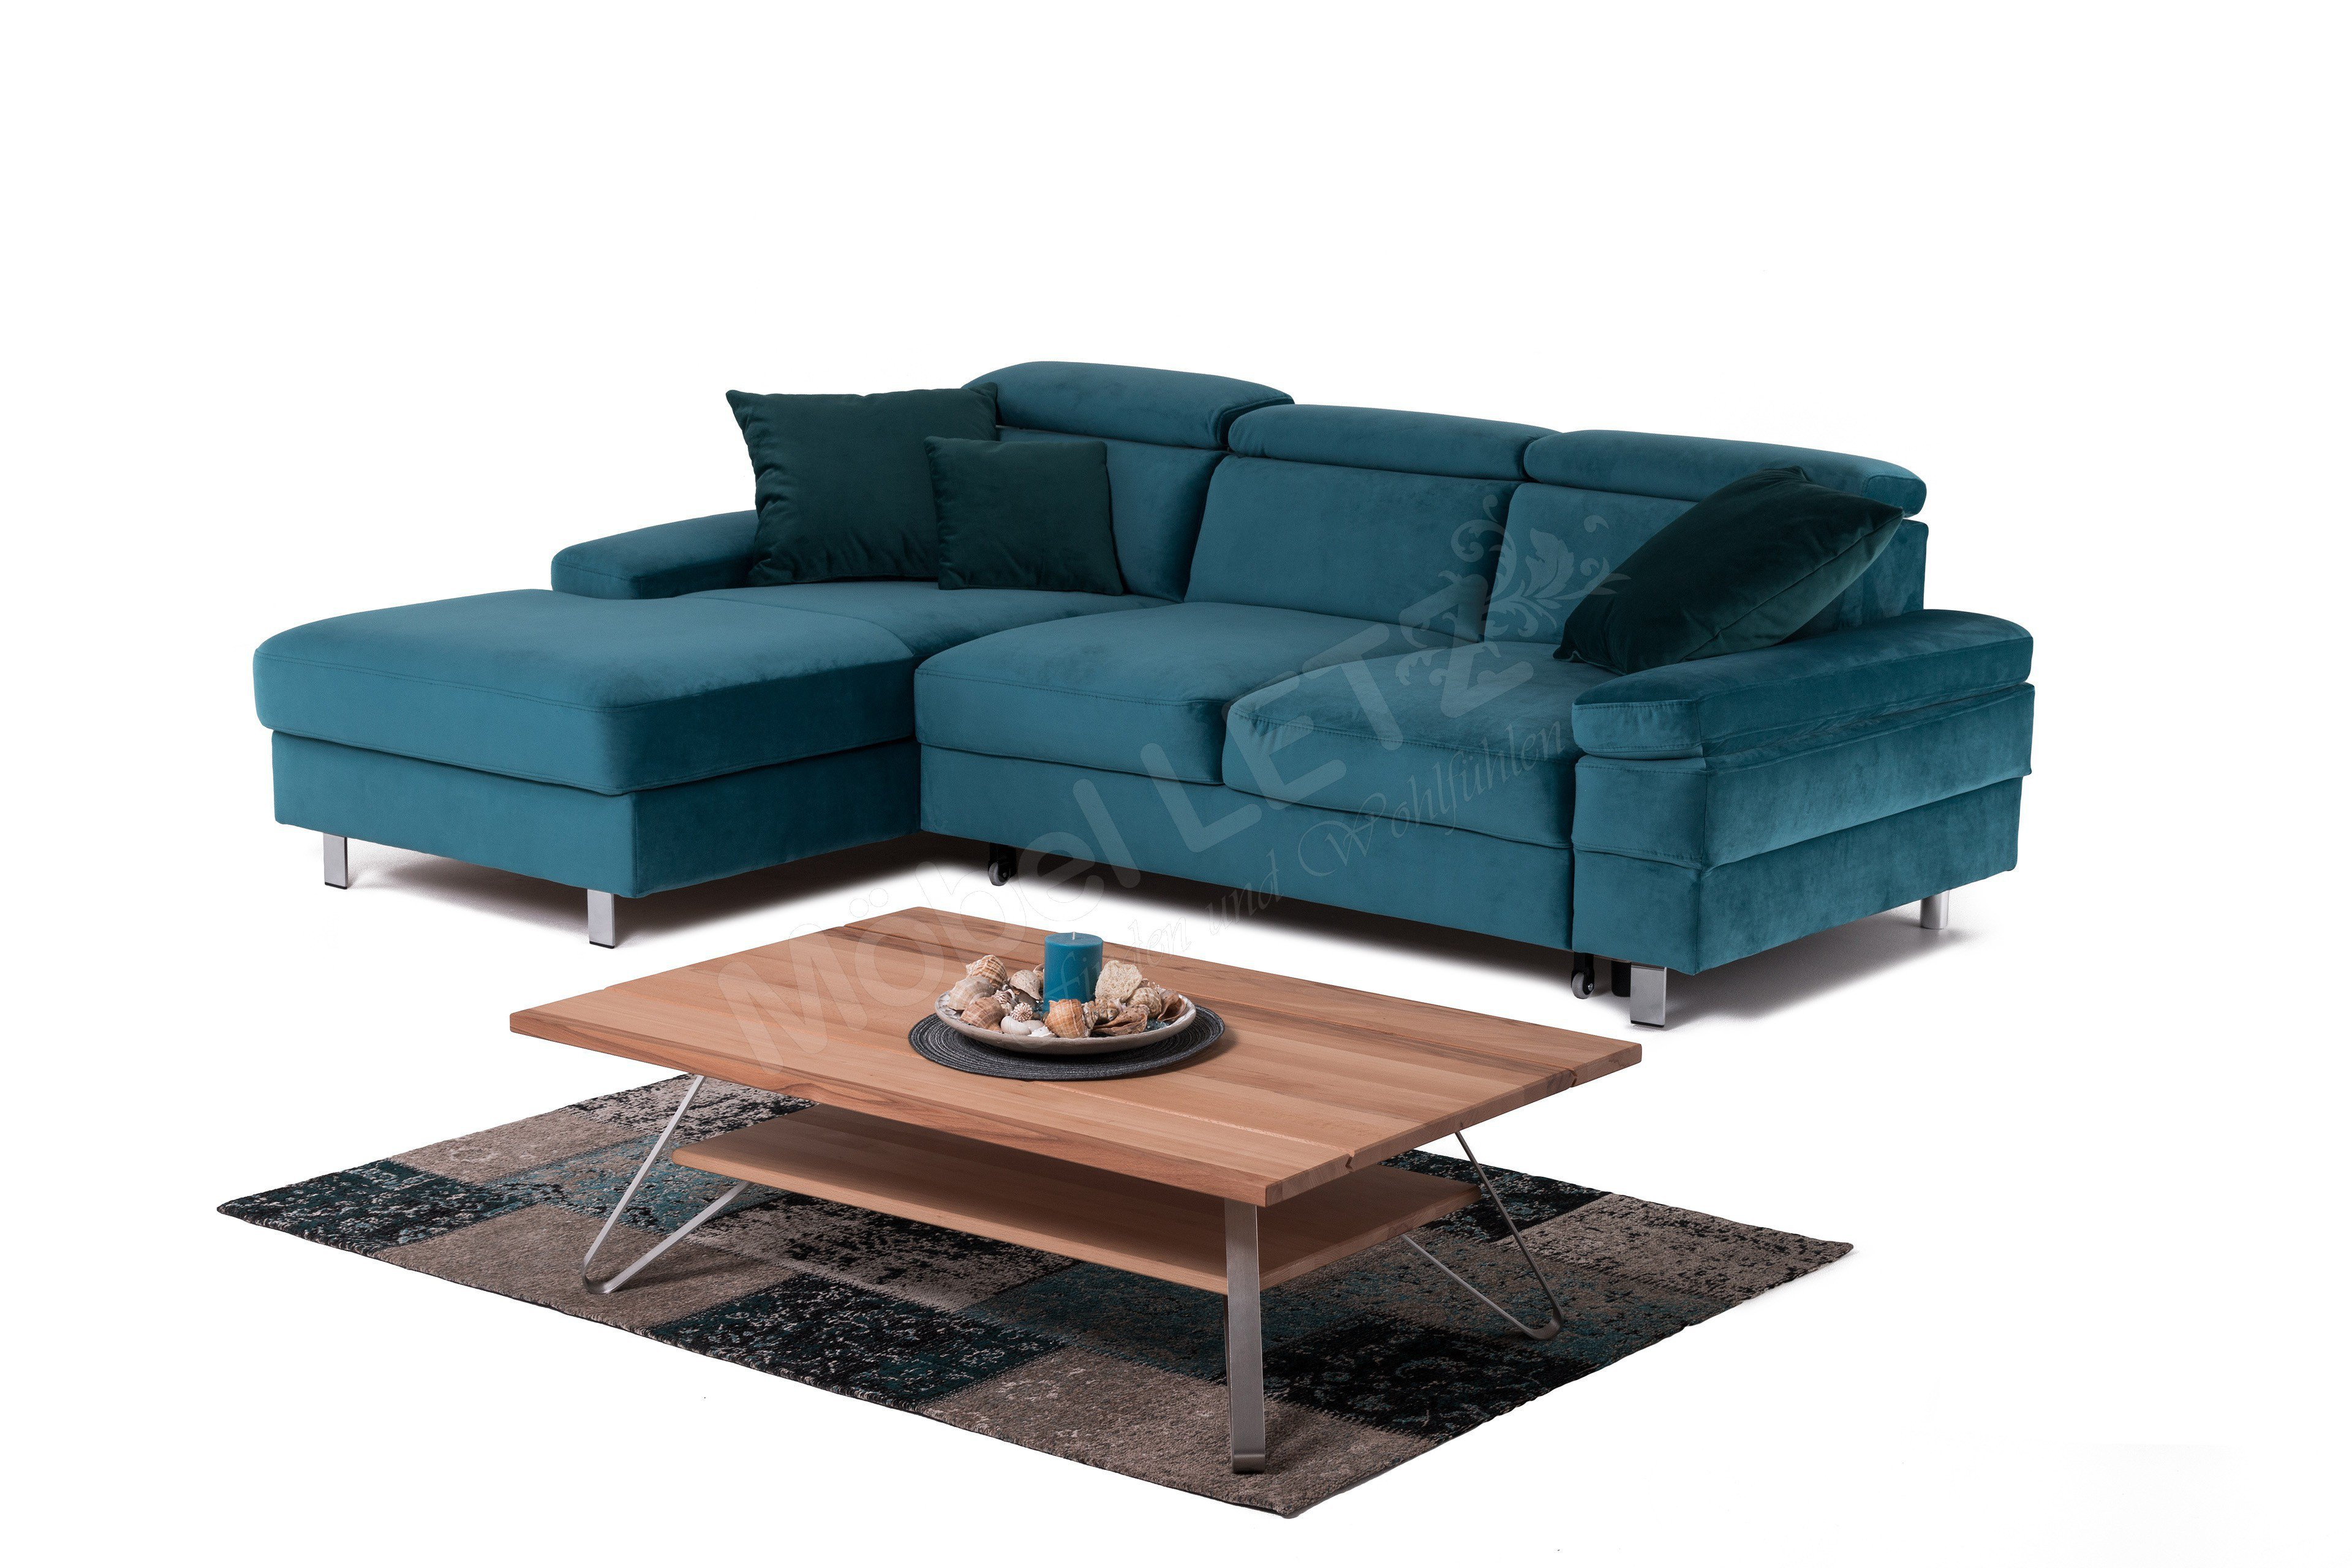 New Look Möbel Elvis Eckcouch in Blau | Möbel Letz - Ihr Online-Shop